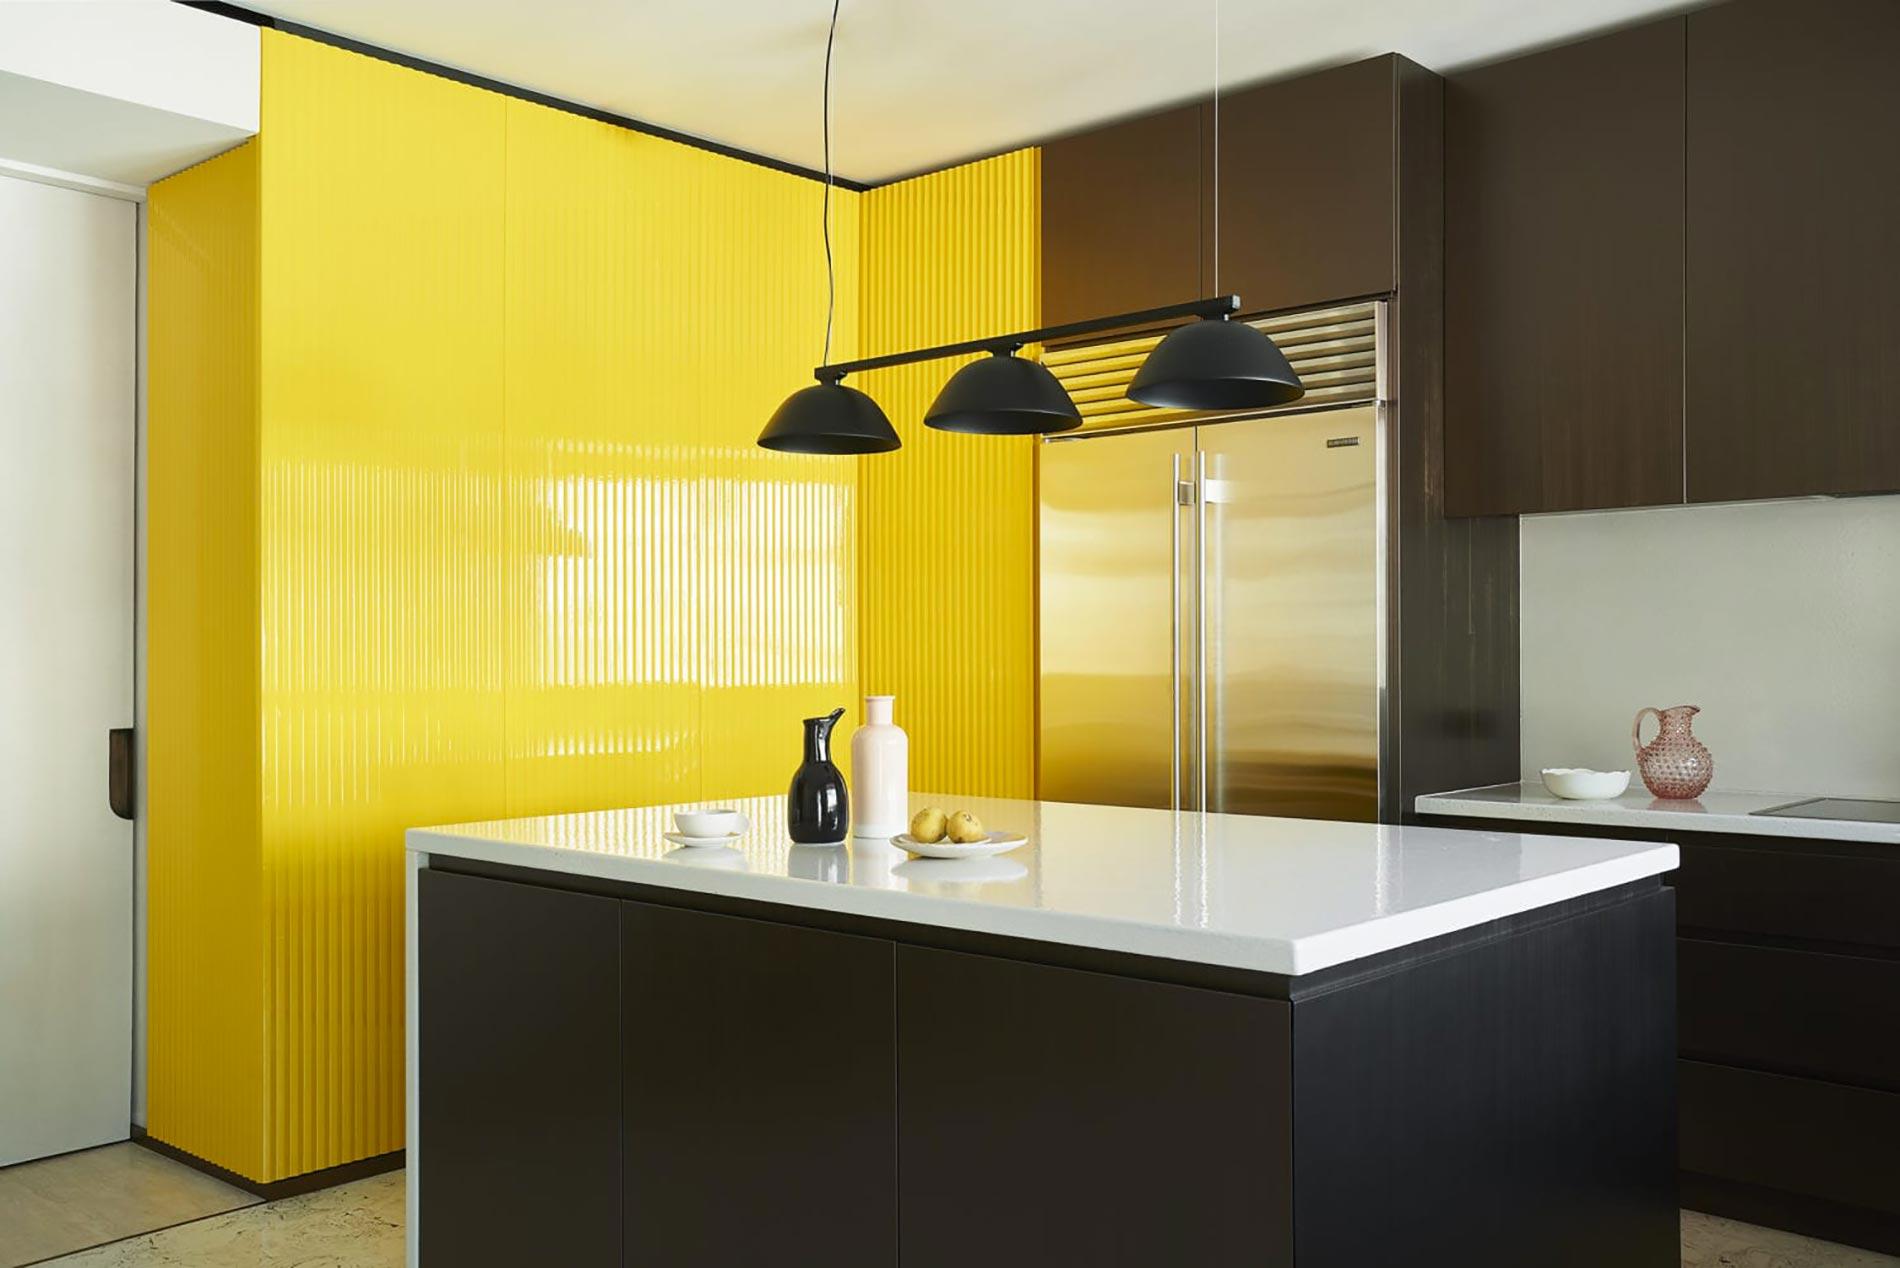 appartamento sud francia cucina